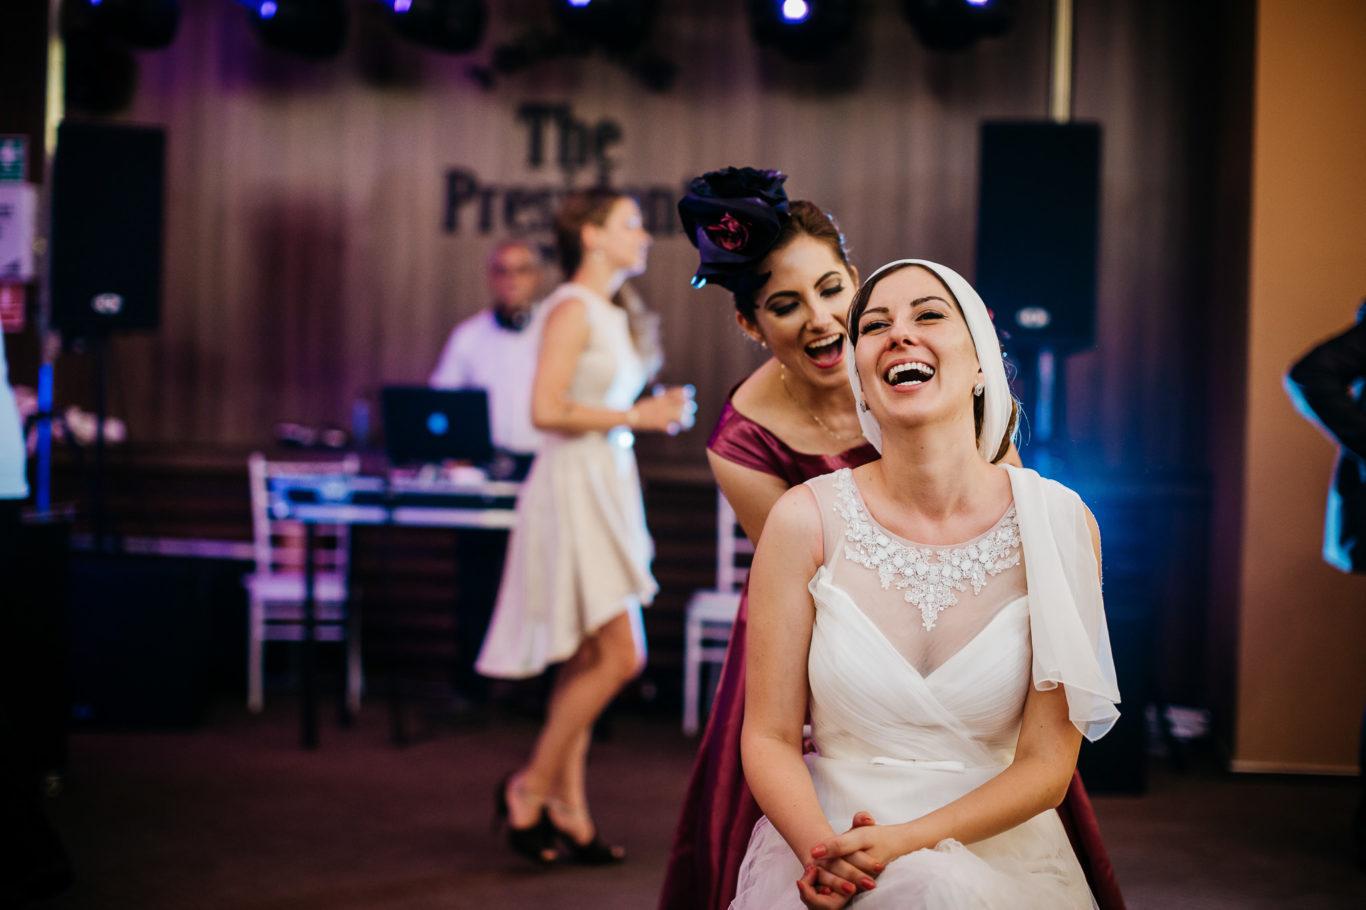 0983-Fotografie-nunta-Bucuresti-Oana-Catalin-fotograf-Ciprian-Dumitrescu-CDF_0303 (2)